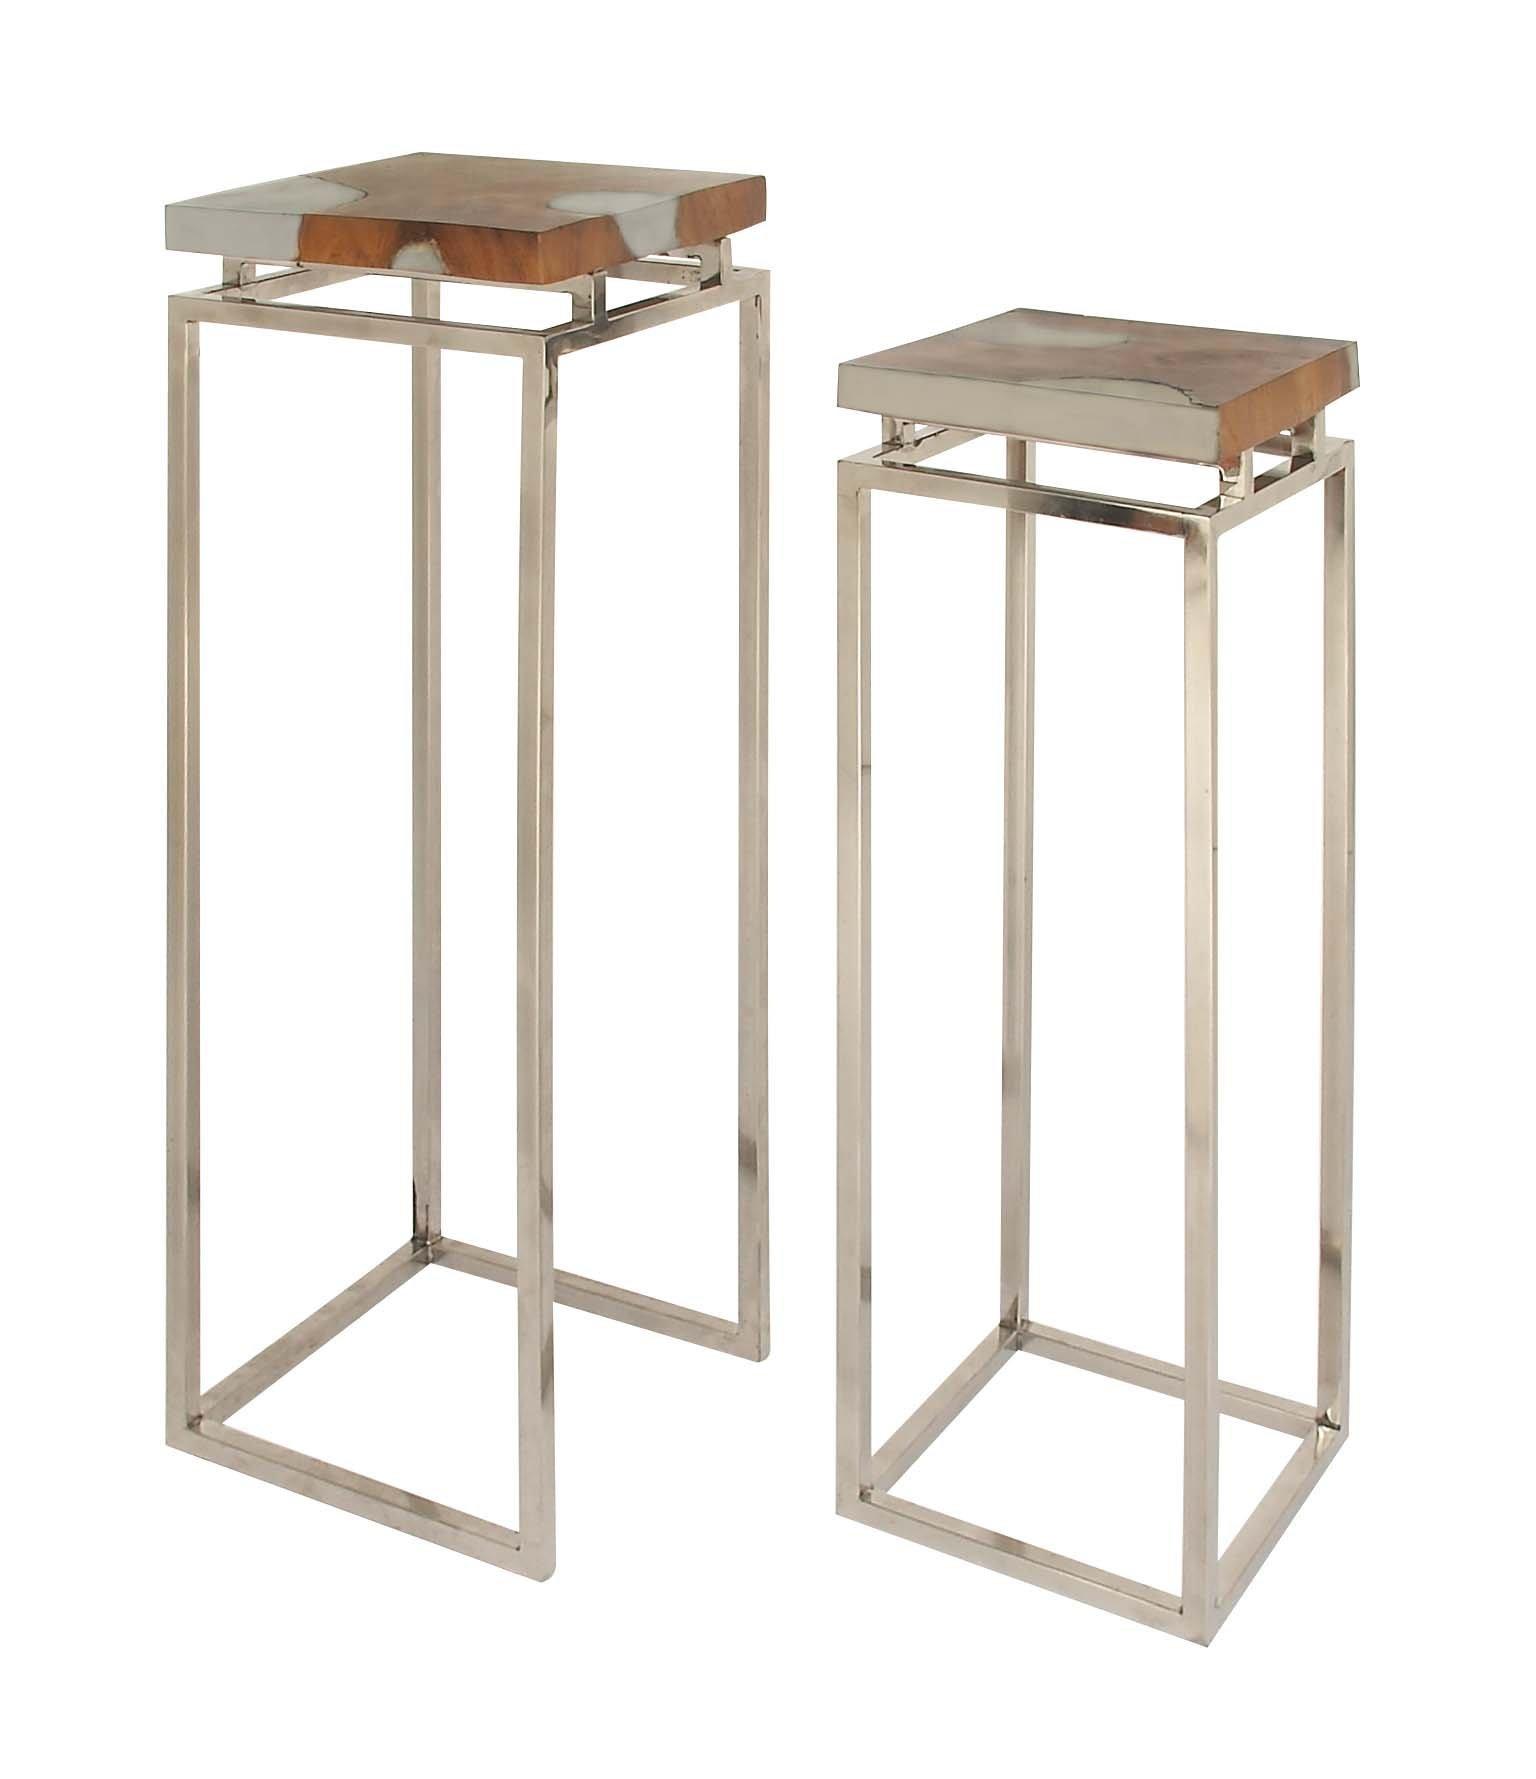 Deco 79 Teak Aluminum Resin Pedestal, 37'' x 42'', Brown/Silver by Deco 79